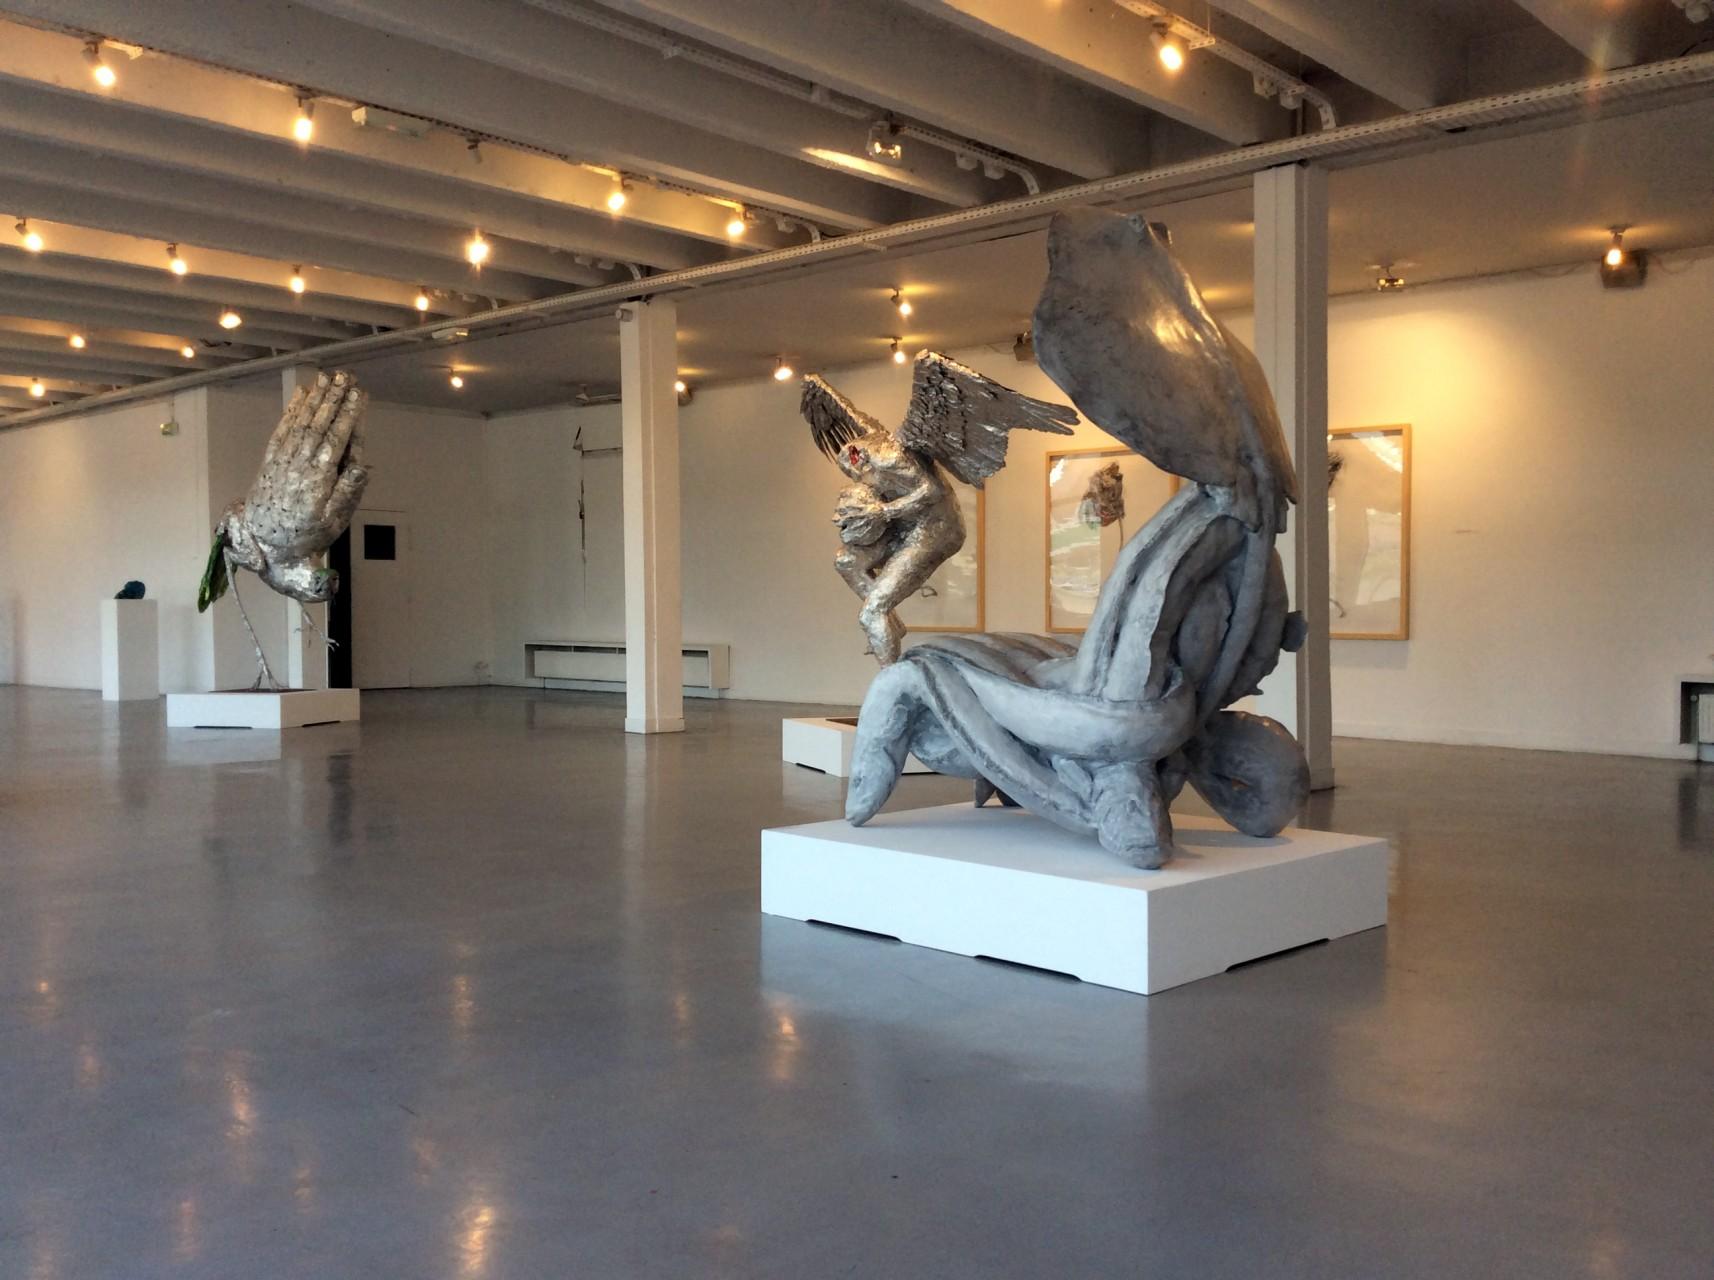 exposition-galerie-julio-gonzalez-laurent-esquerre-3